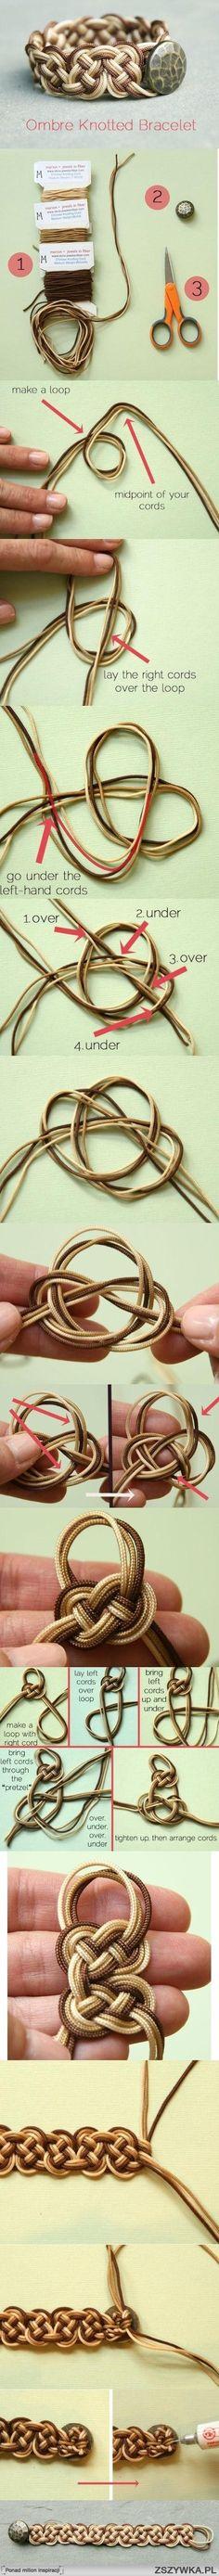 Pulsera de nudos  Ombre knotted bracelet